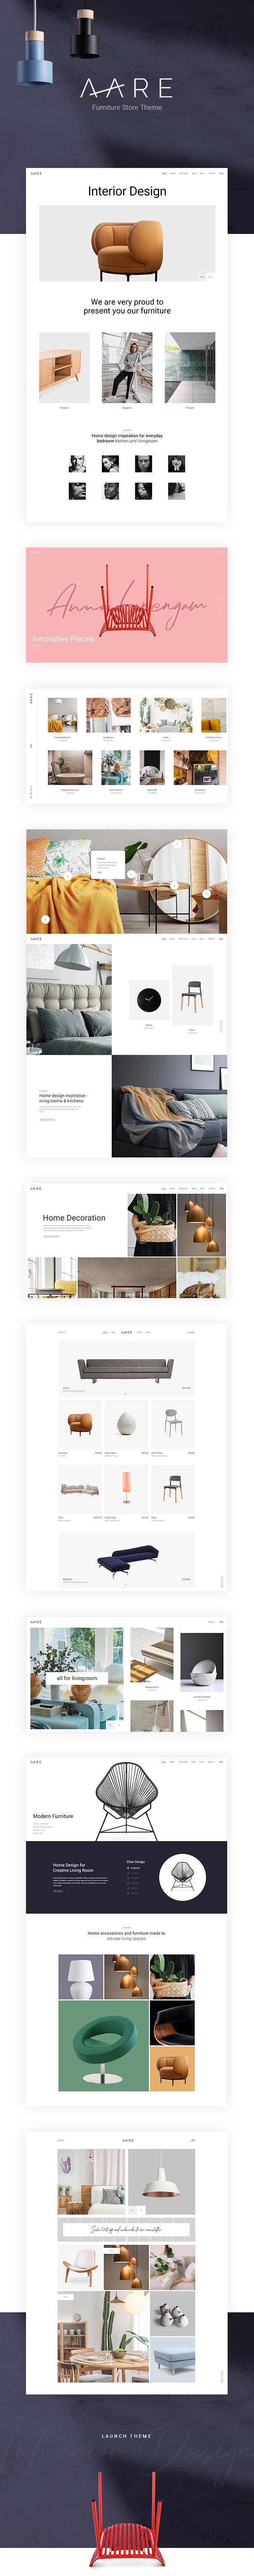 Aare - Furniture Store WordPress Theme - 1